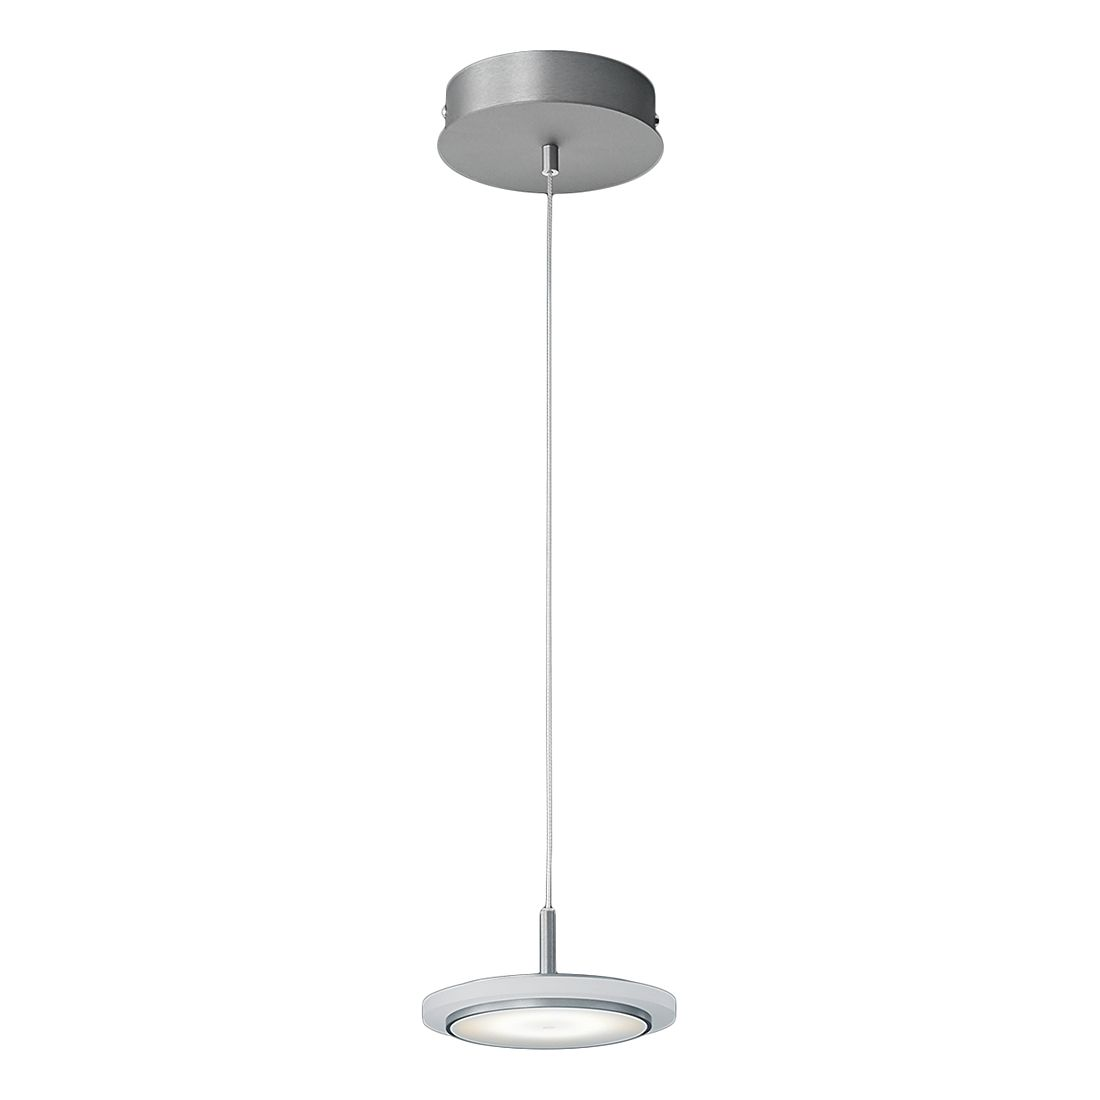 EEK A+, Pendelleuchte RUBI – Metall/Kunststoff – Silber, Helestra günstig online kaufen